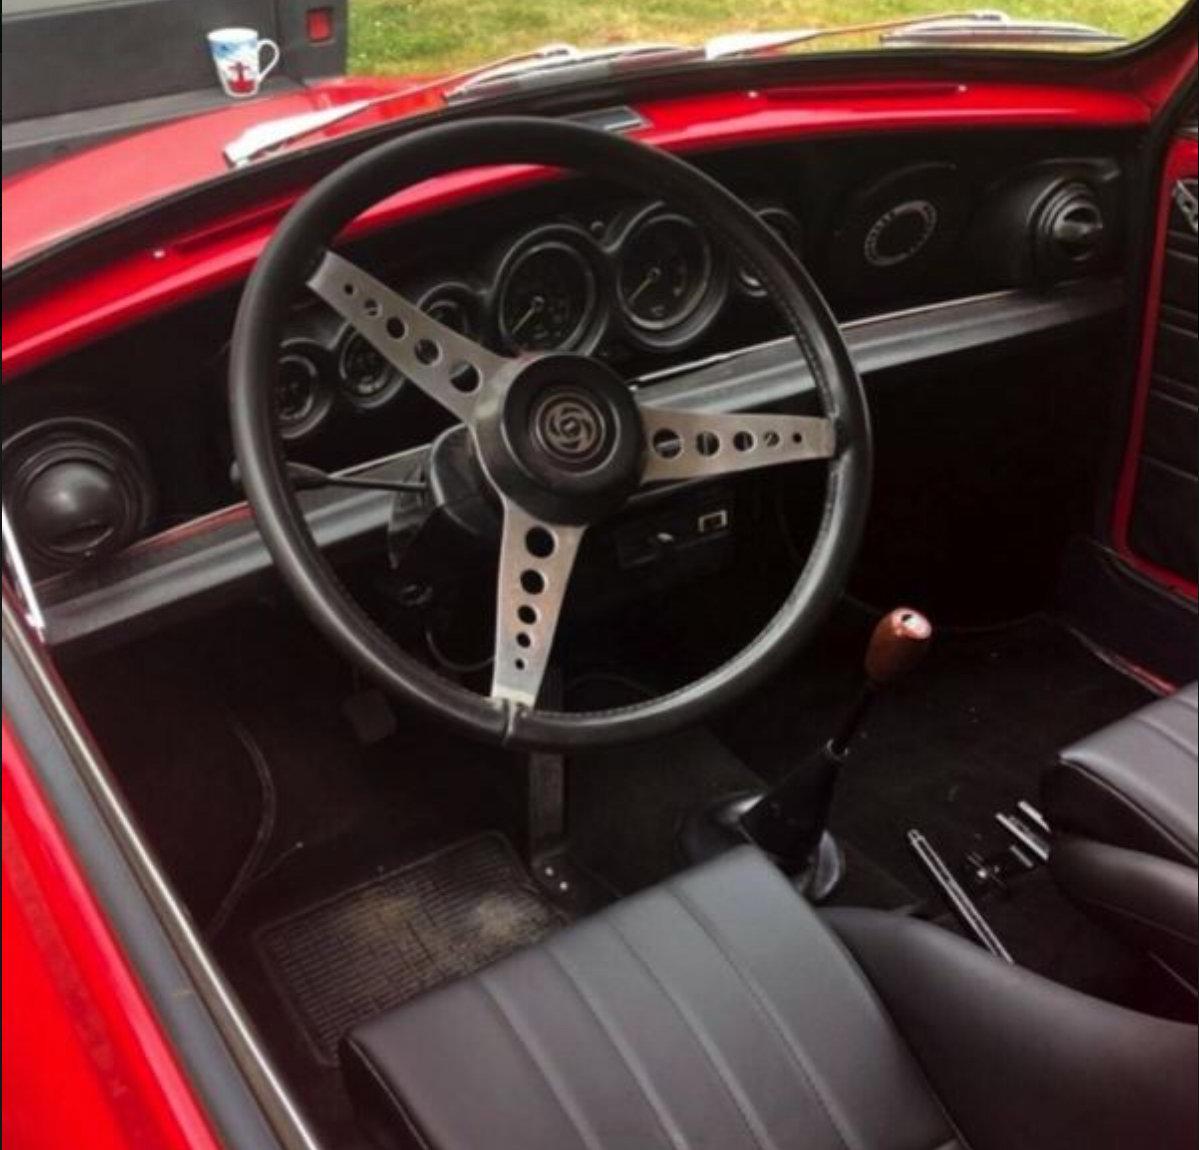 1975 Morris Mini Cooper 1300 For Sale (picture 5 of 6)